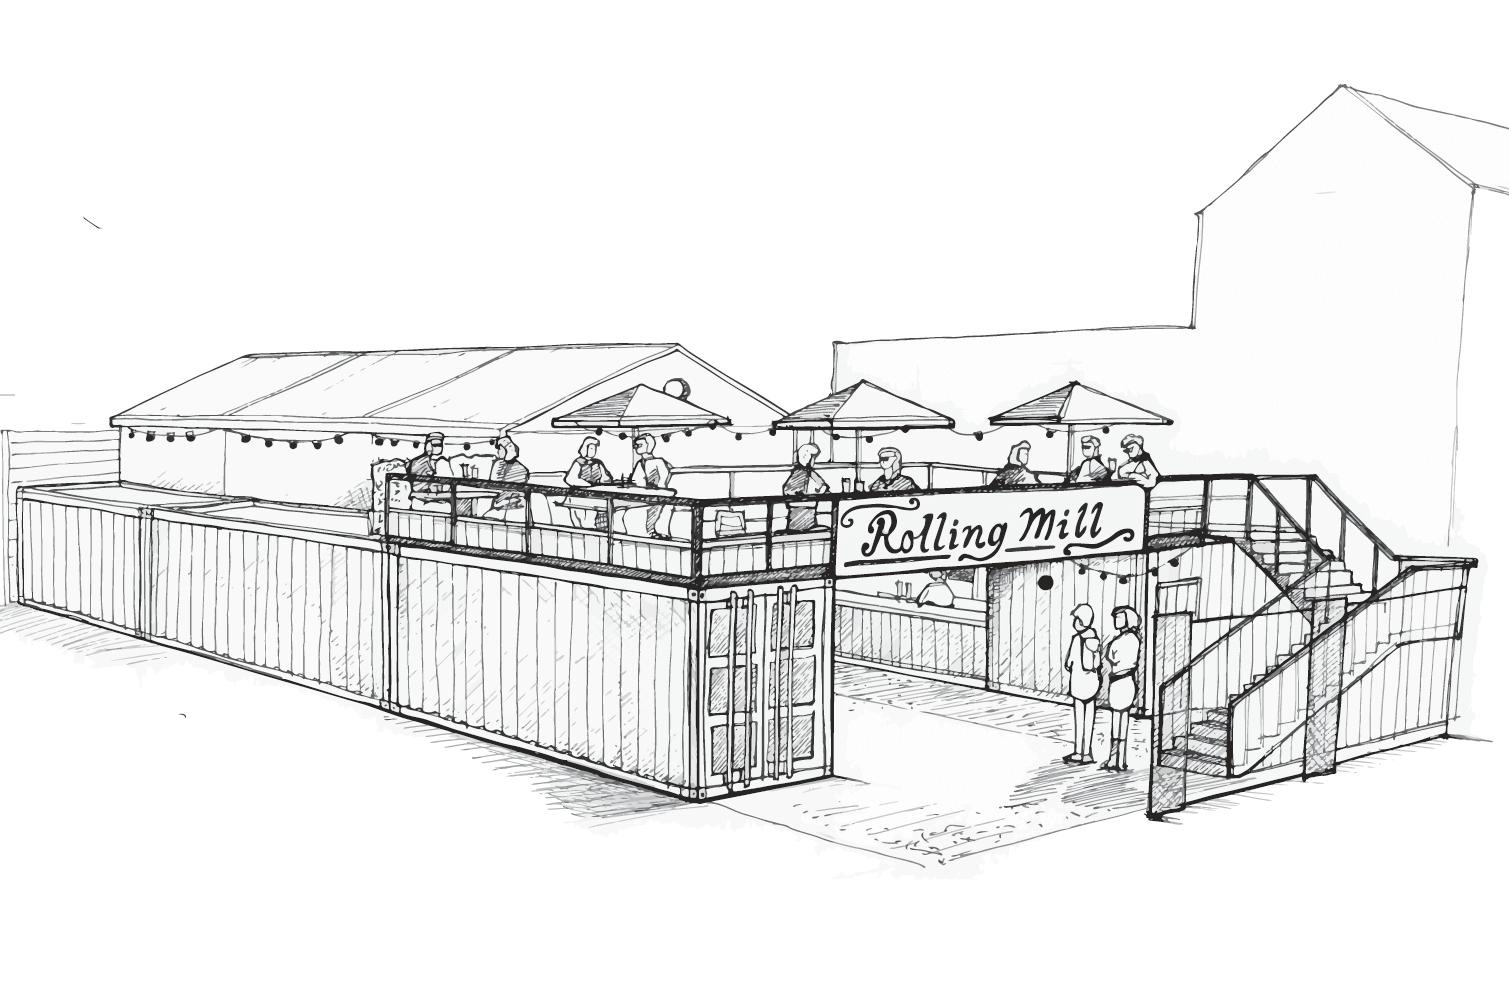 The Rolling Mill Restaurant CGI